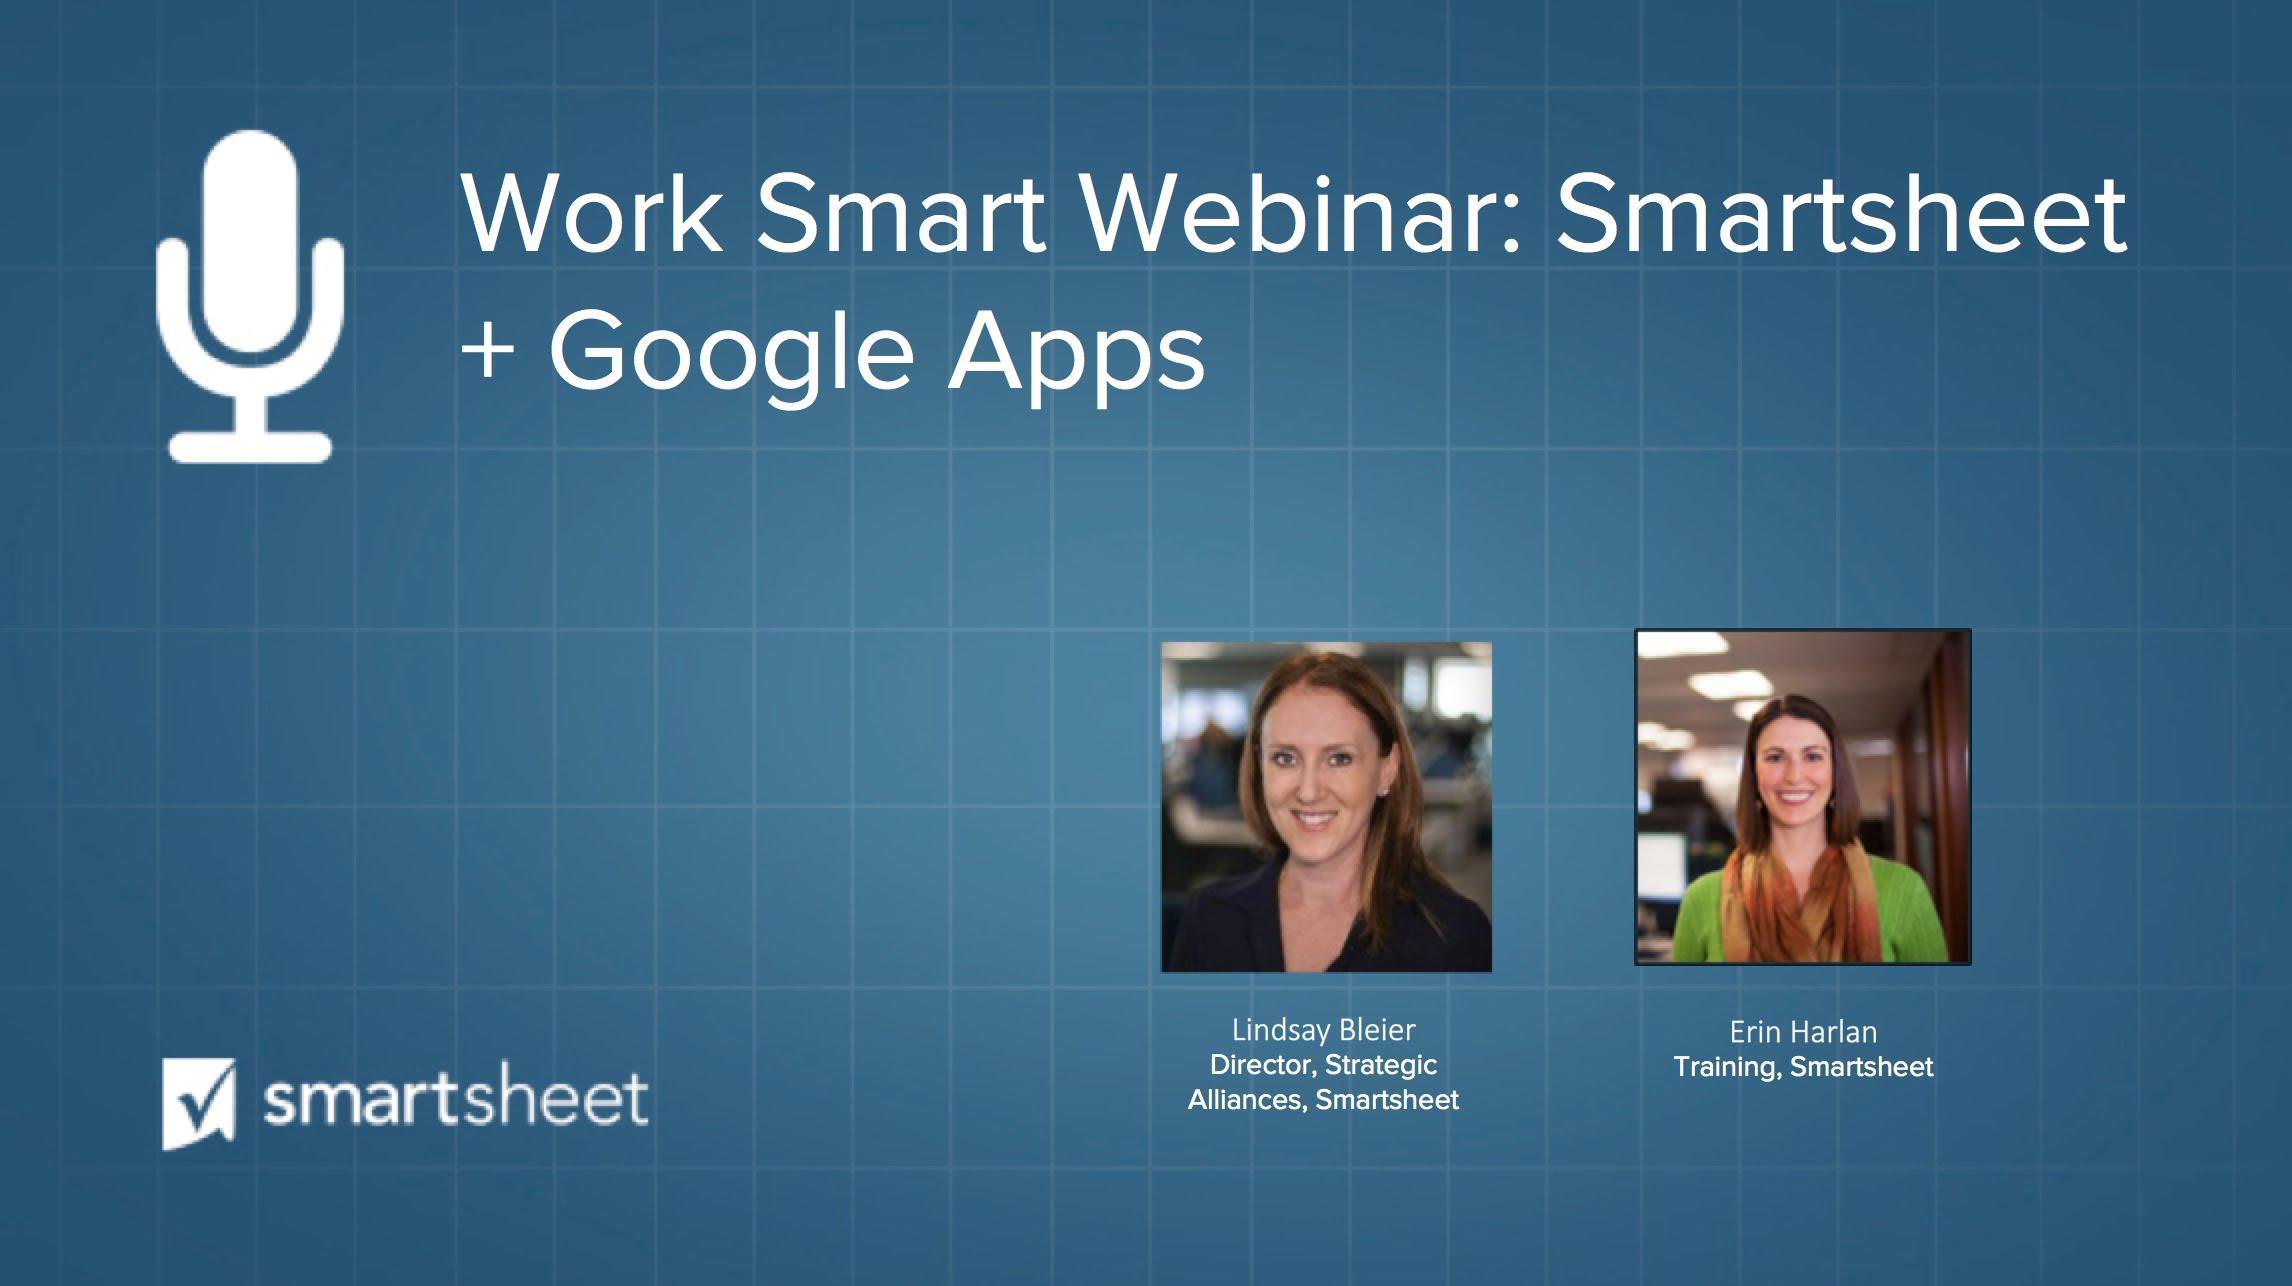 Smartsheet + Google Apps | Work Smart Webinar